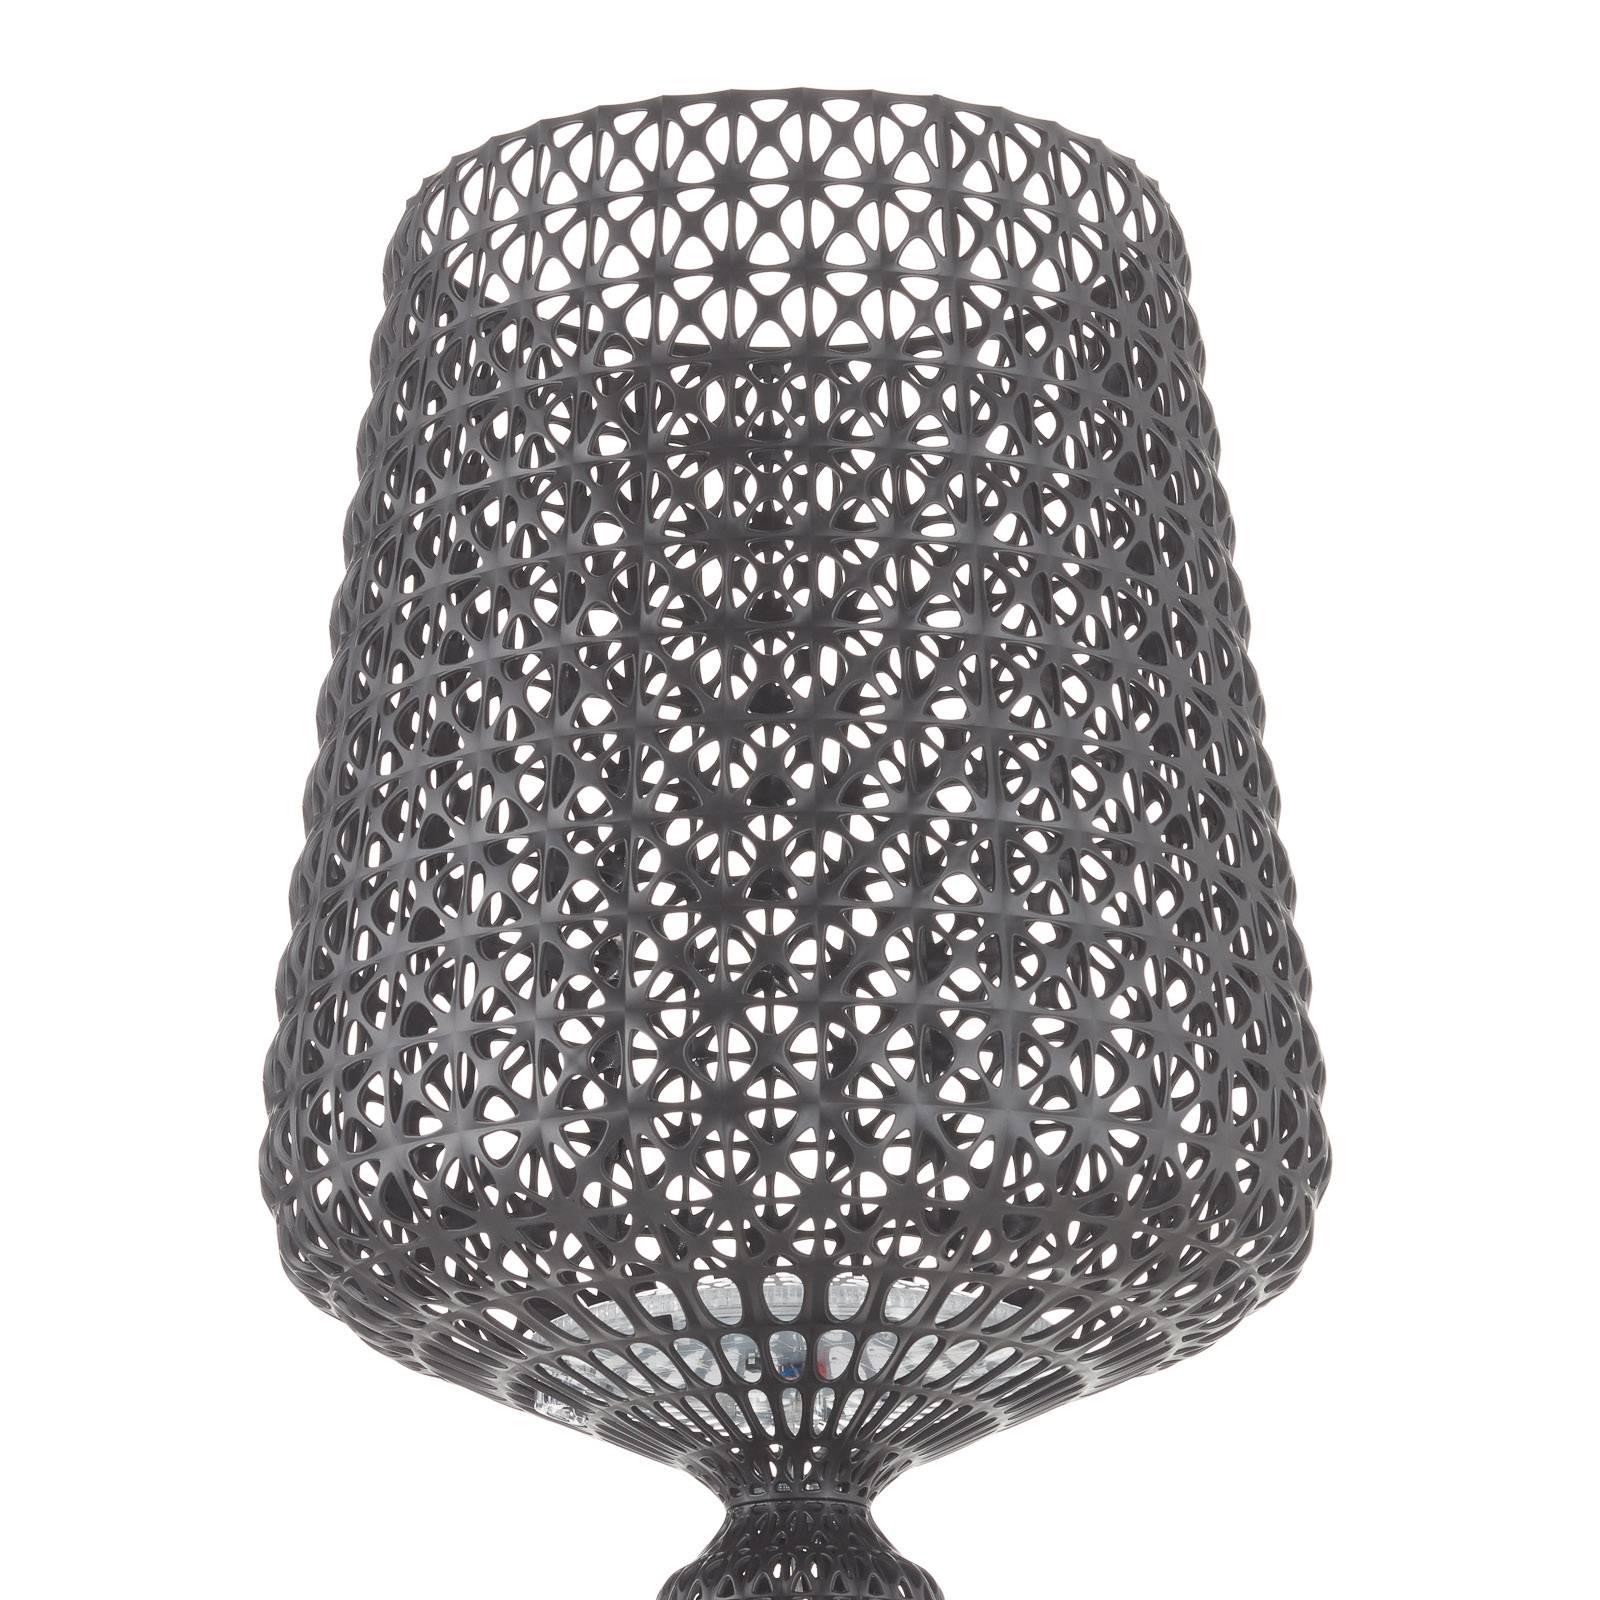 Designerska lampa stojąca LED Kabuki, czarna